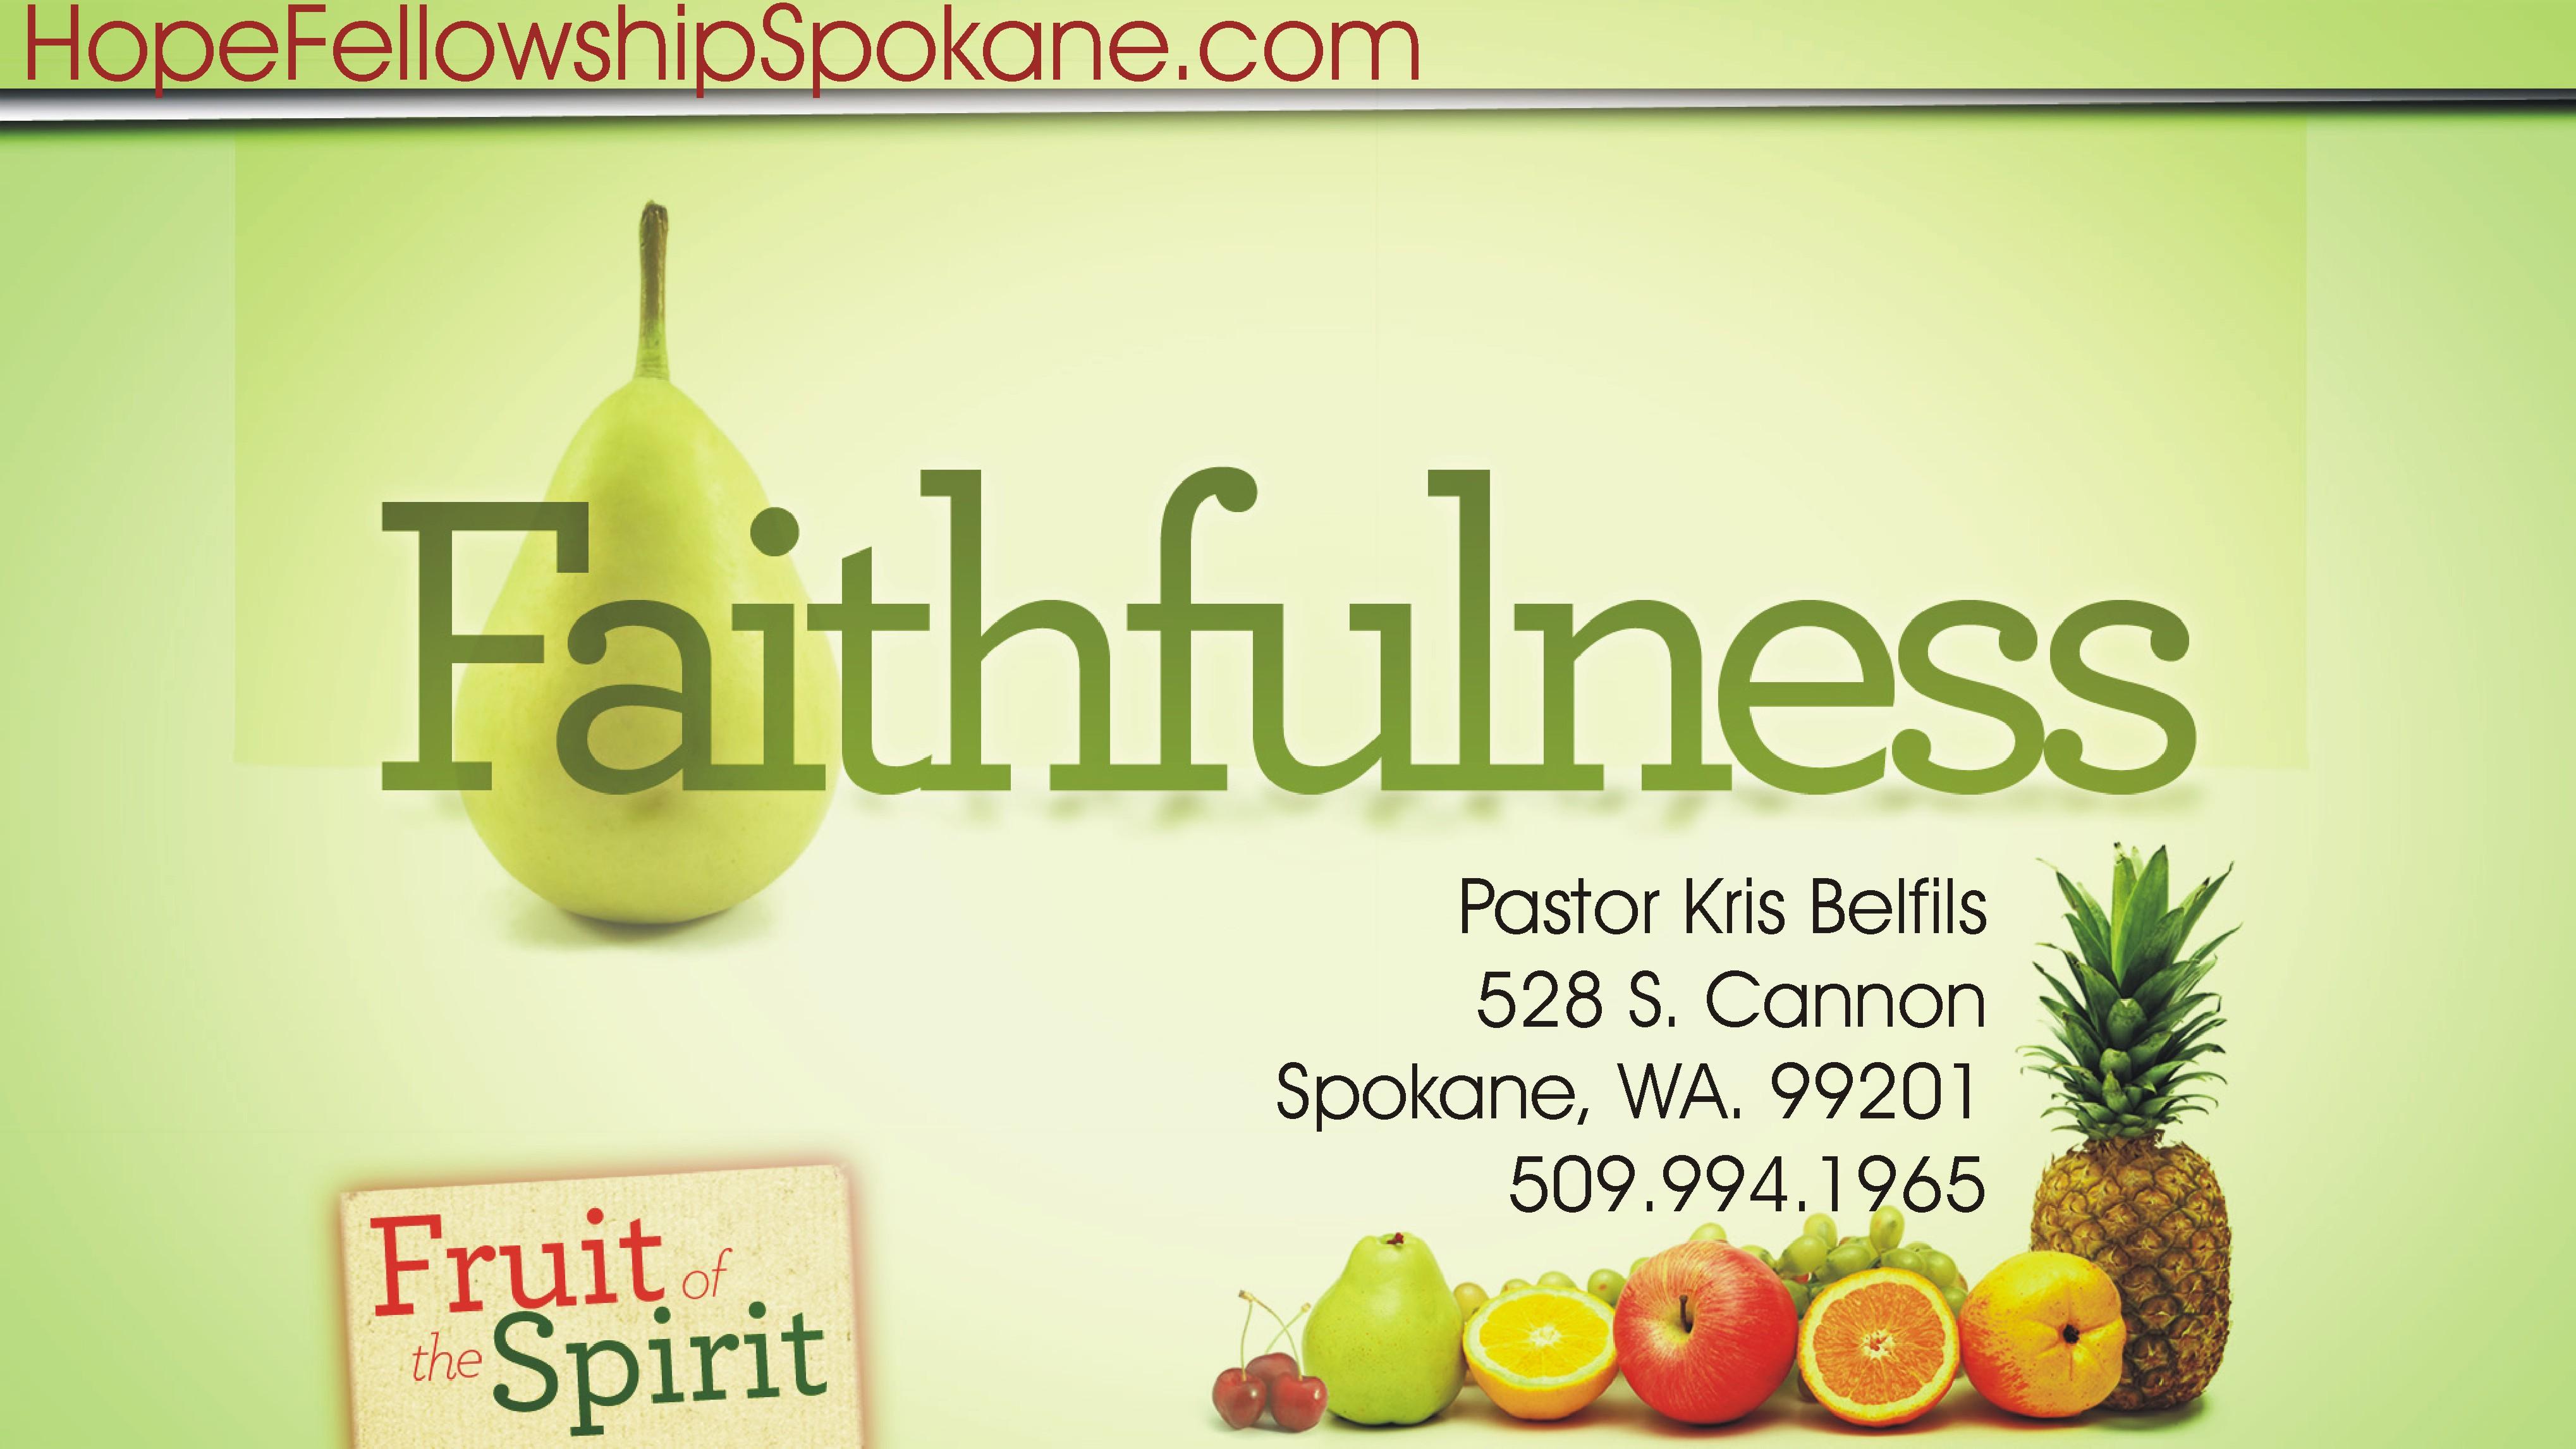 Fruit Of The Spirit Faithfulness Pastor Kris Belfils